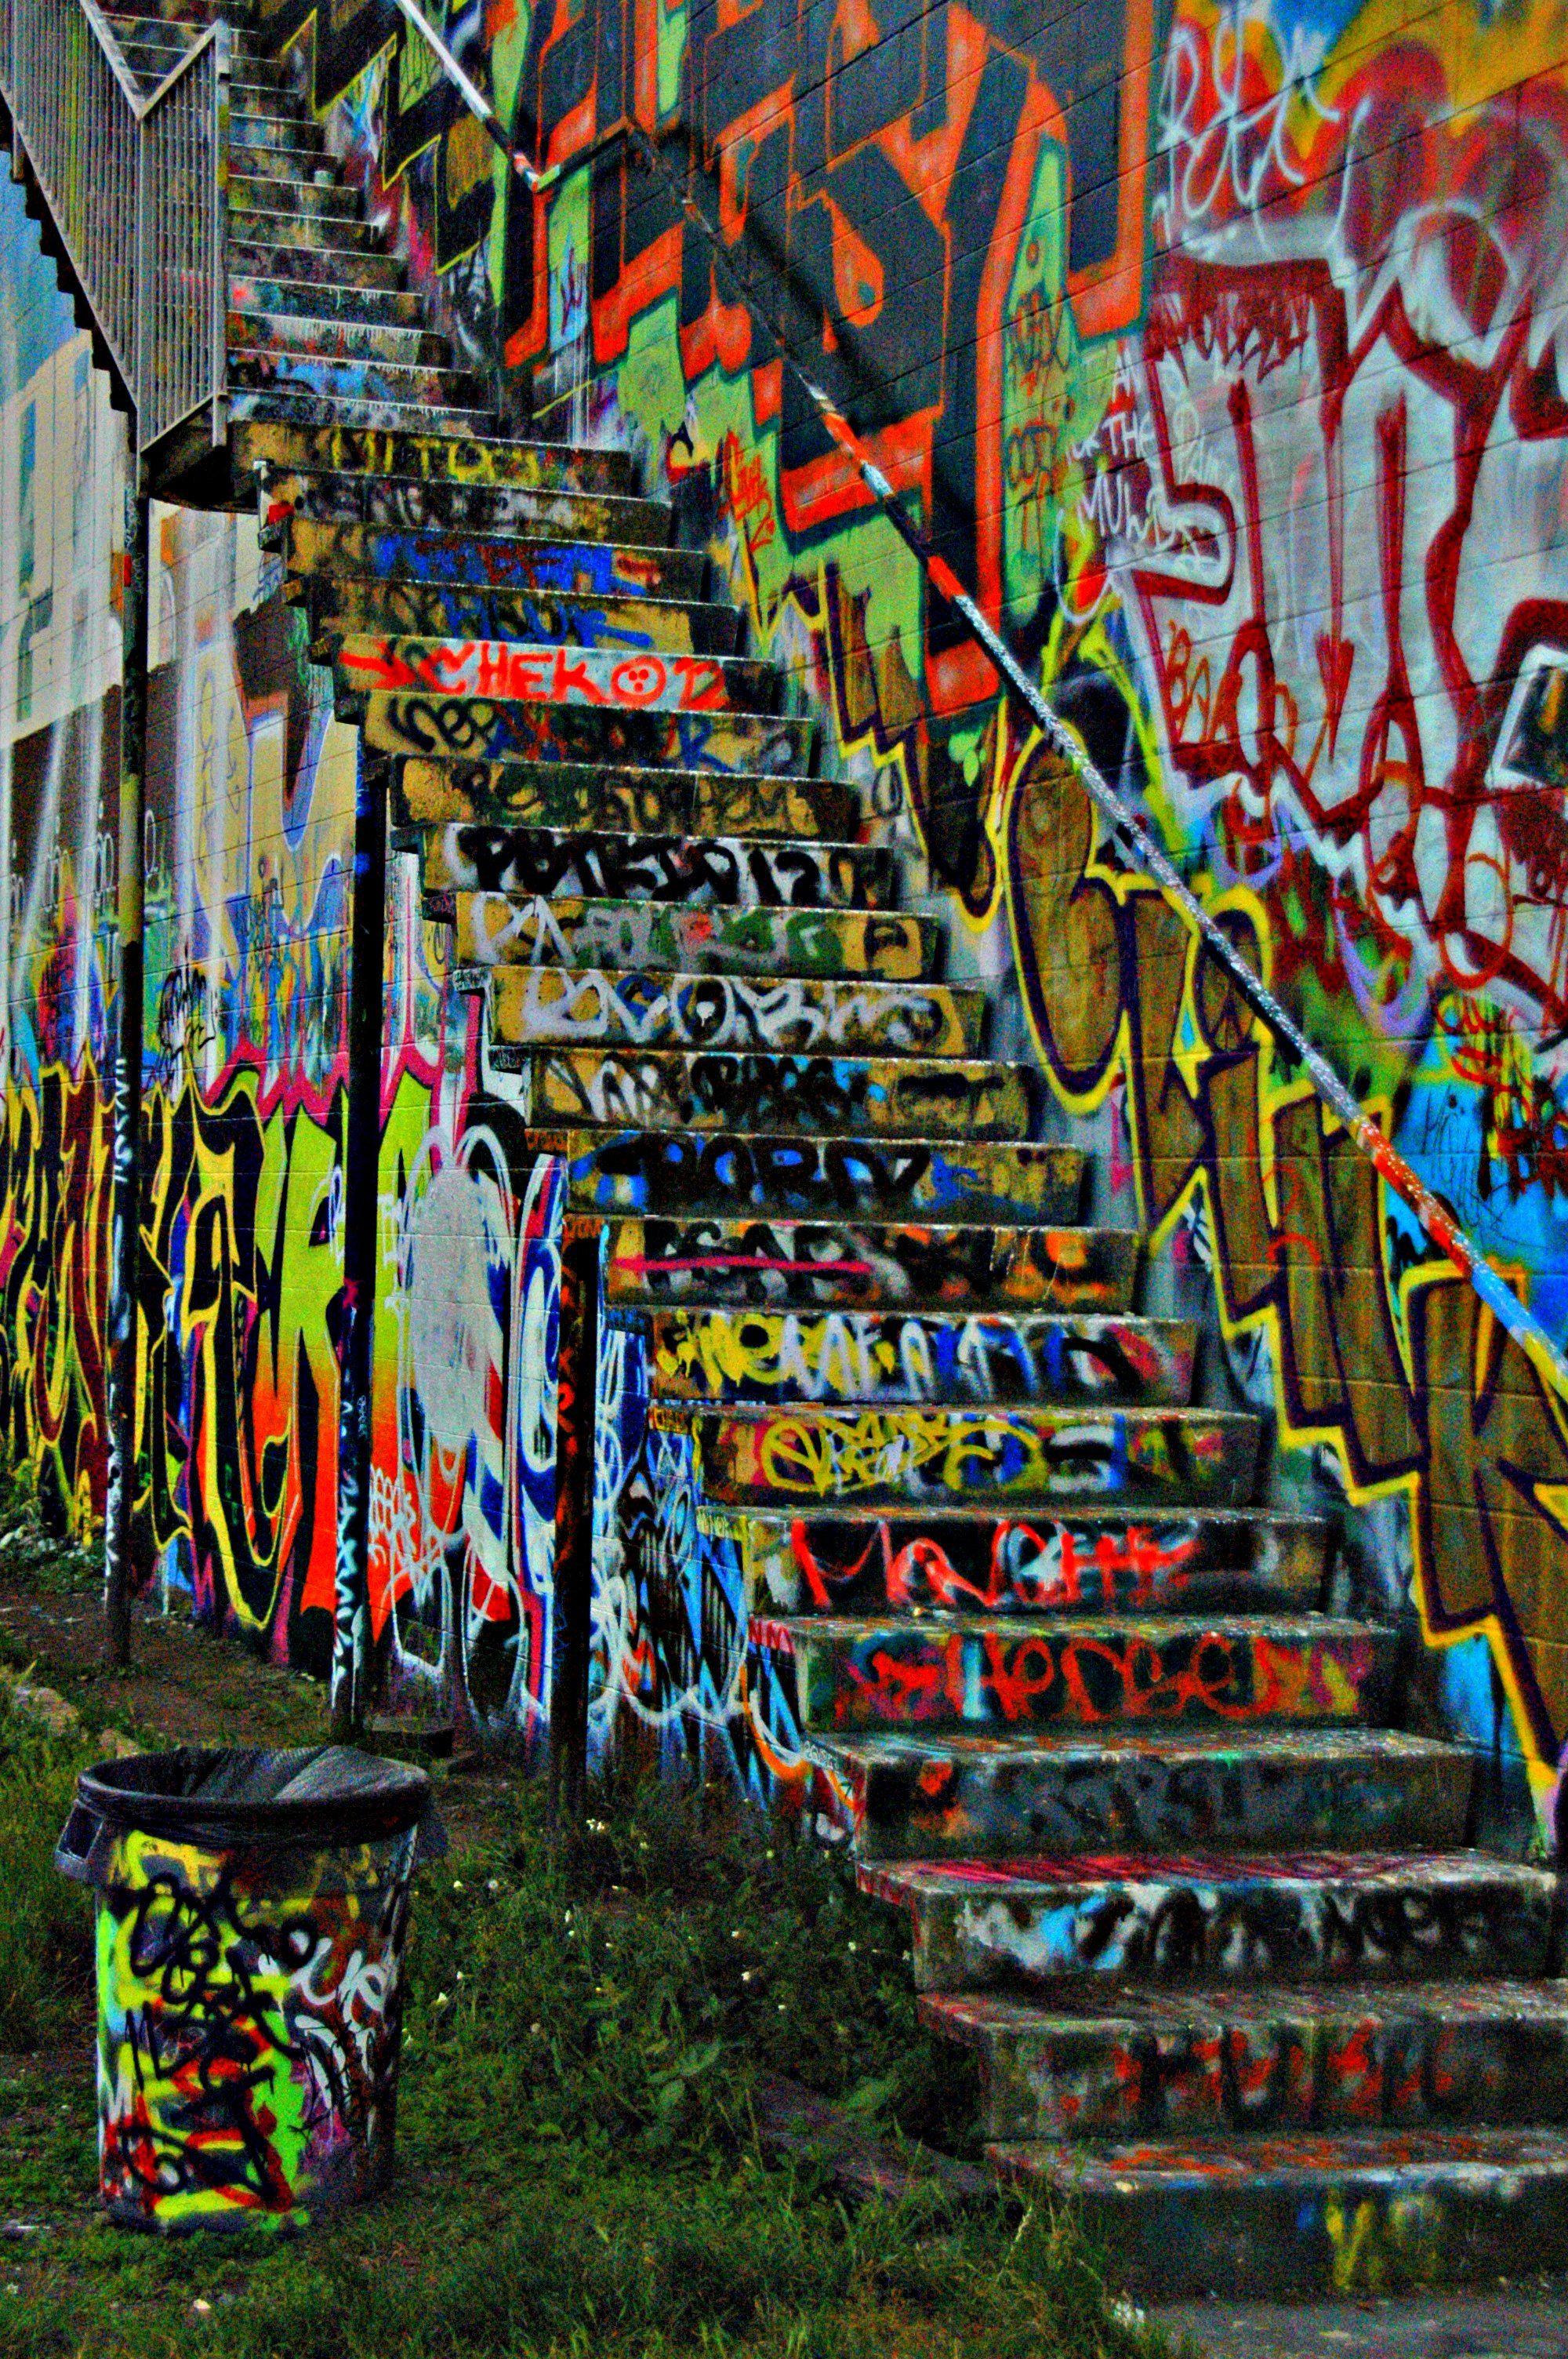 graffiti wall in seattle 3 grafite de rua arte de rua on simply wall street id=36962